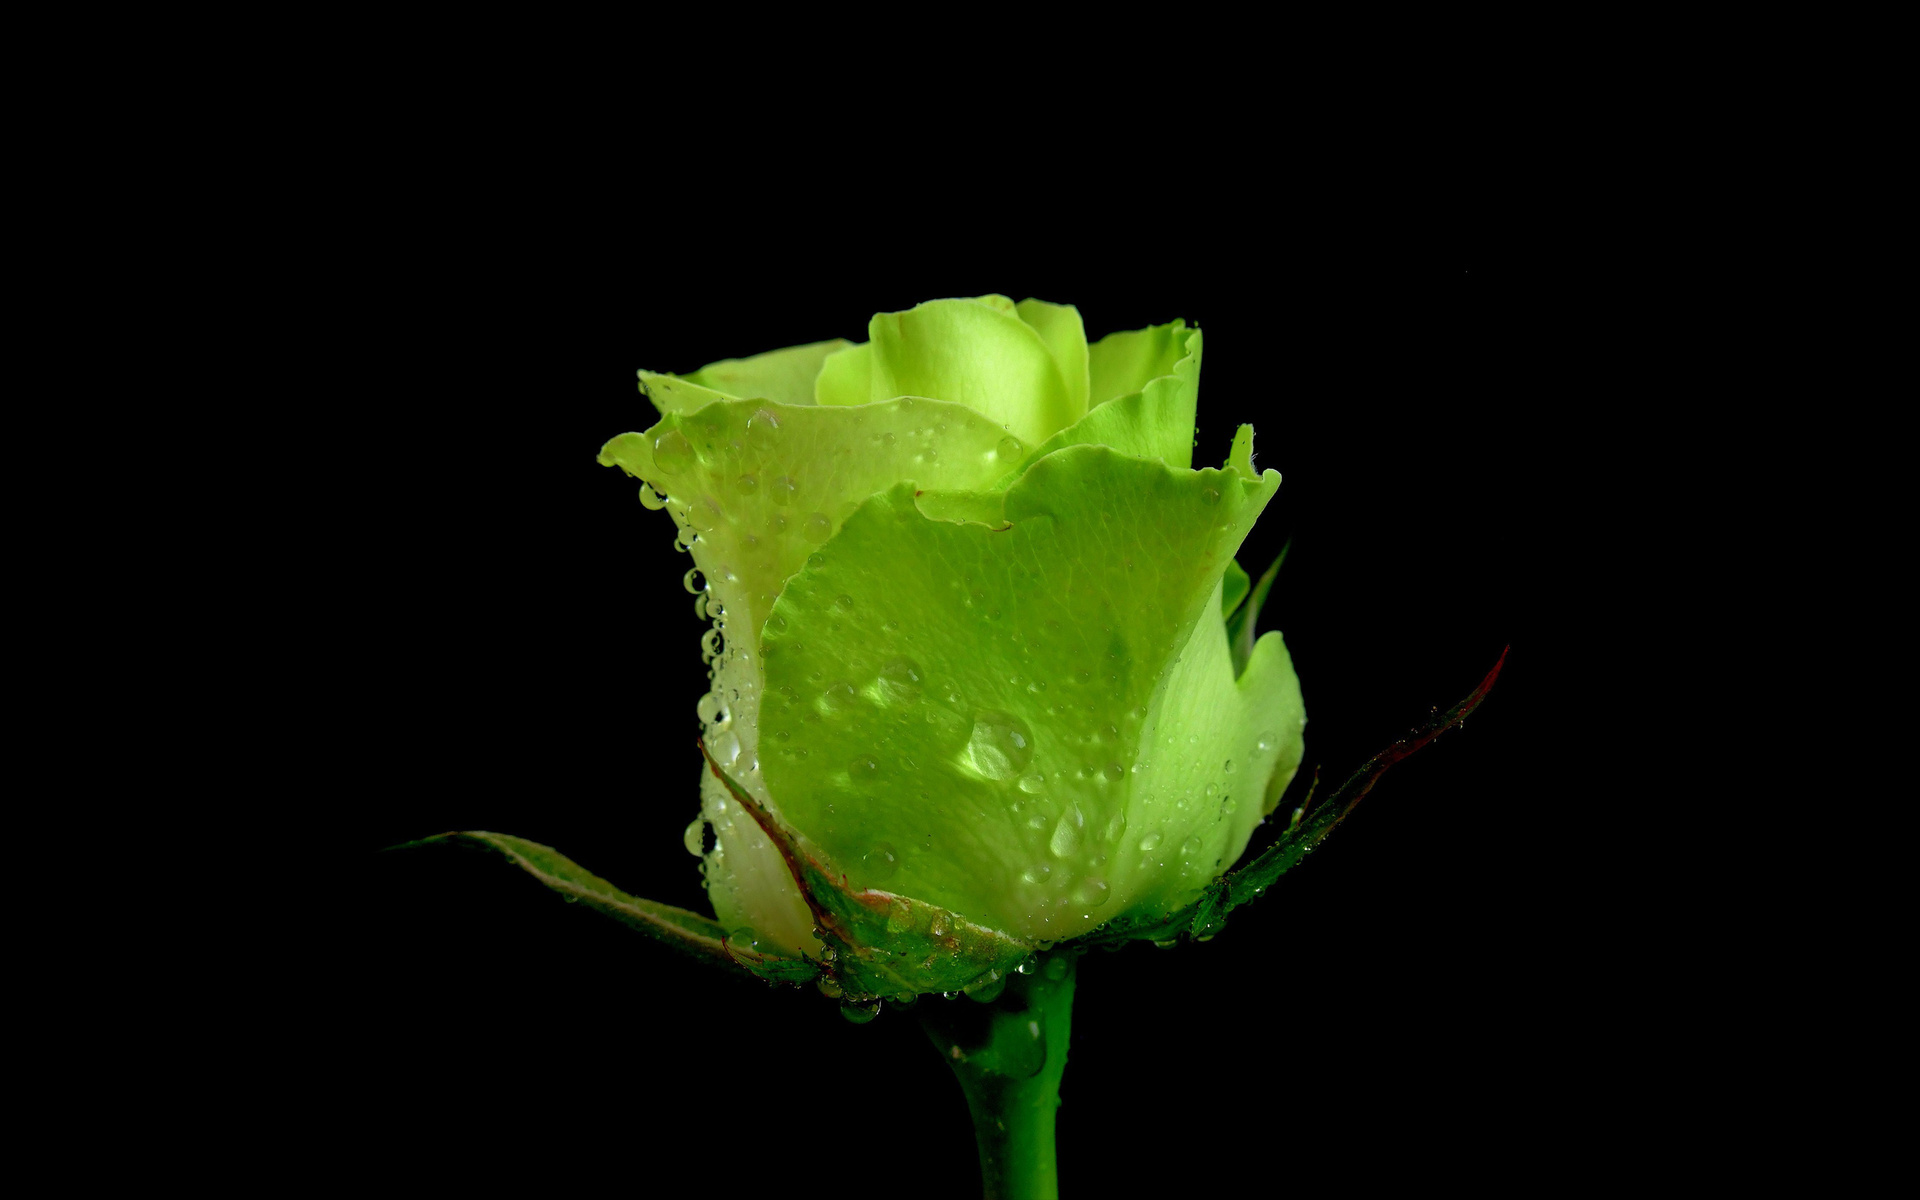 Green Rose Images 6 Cool Wallpaper